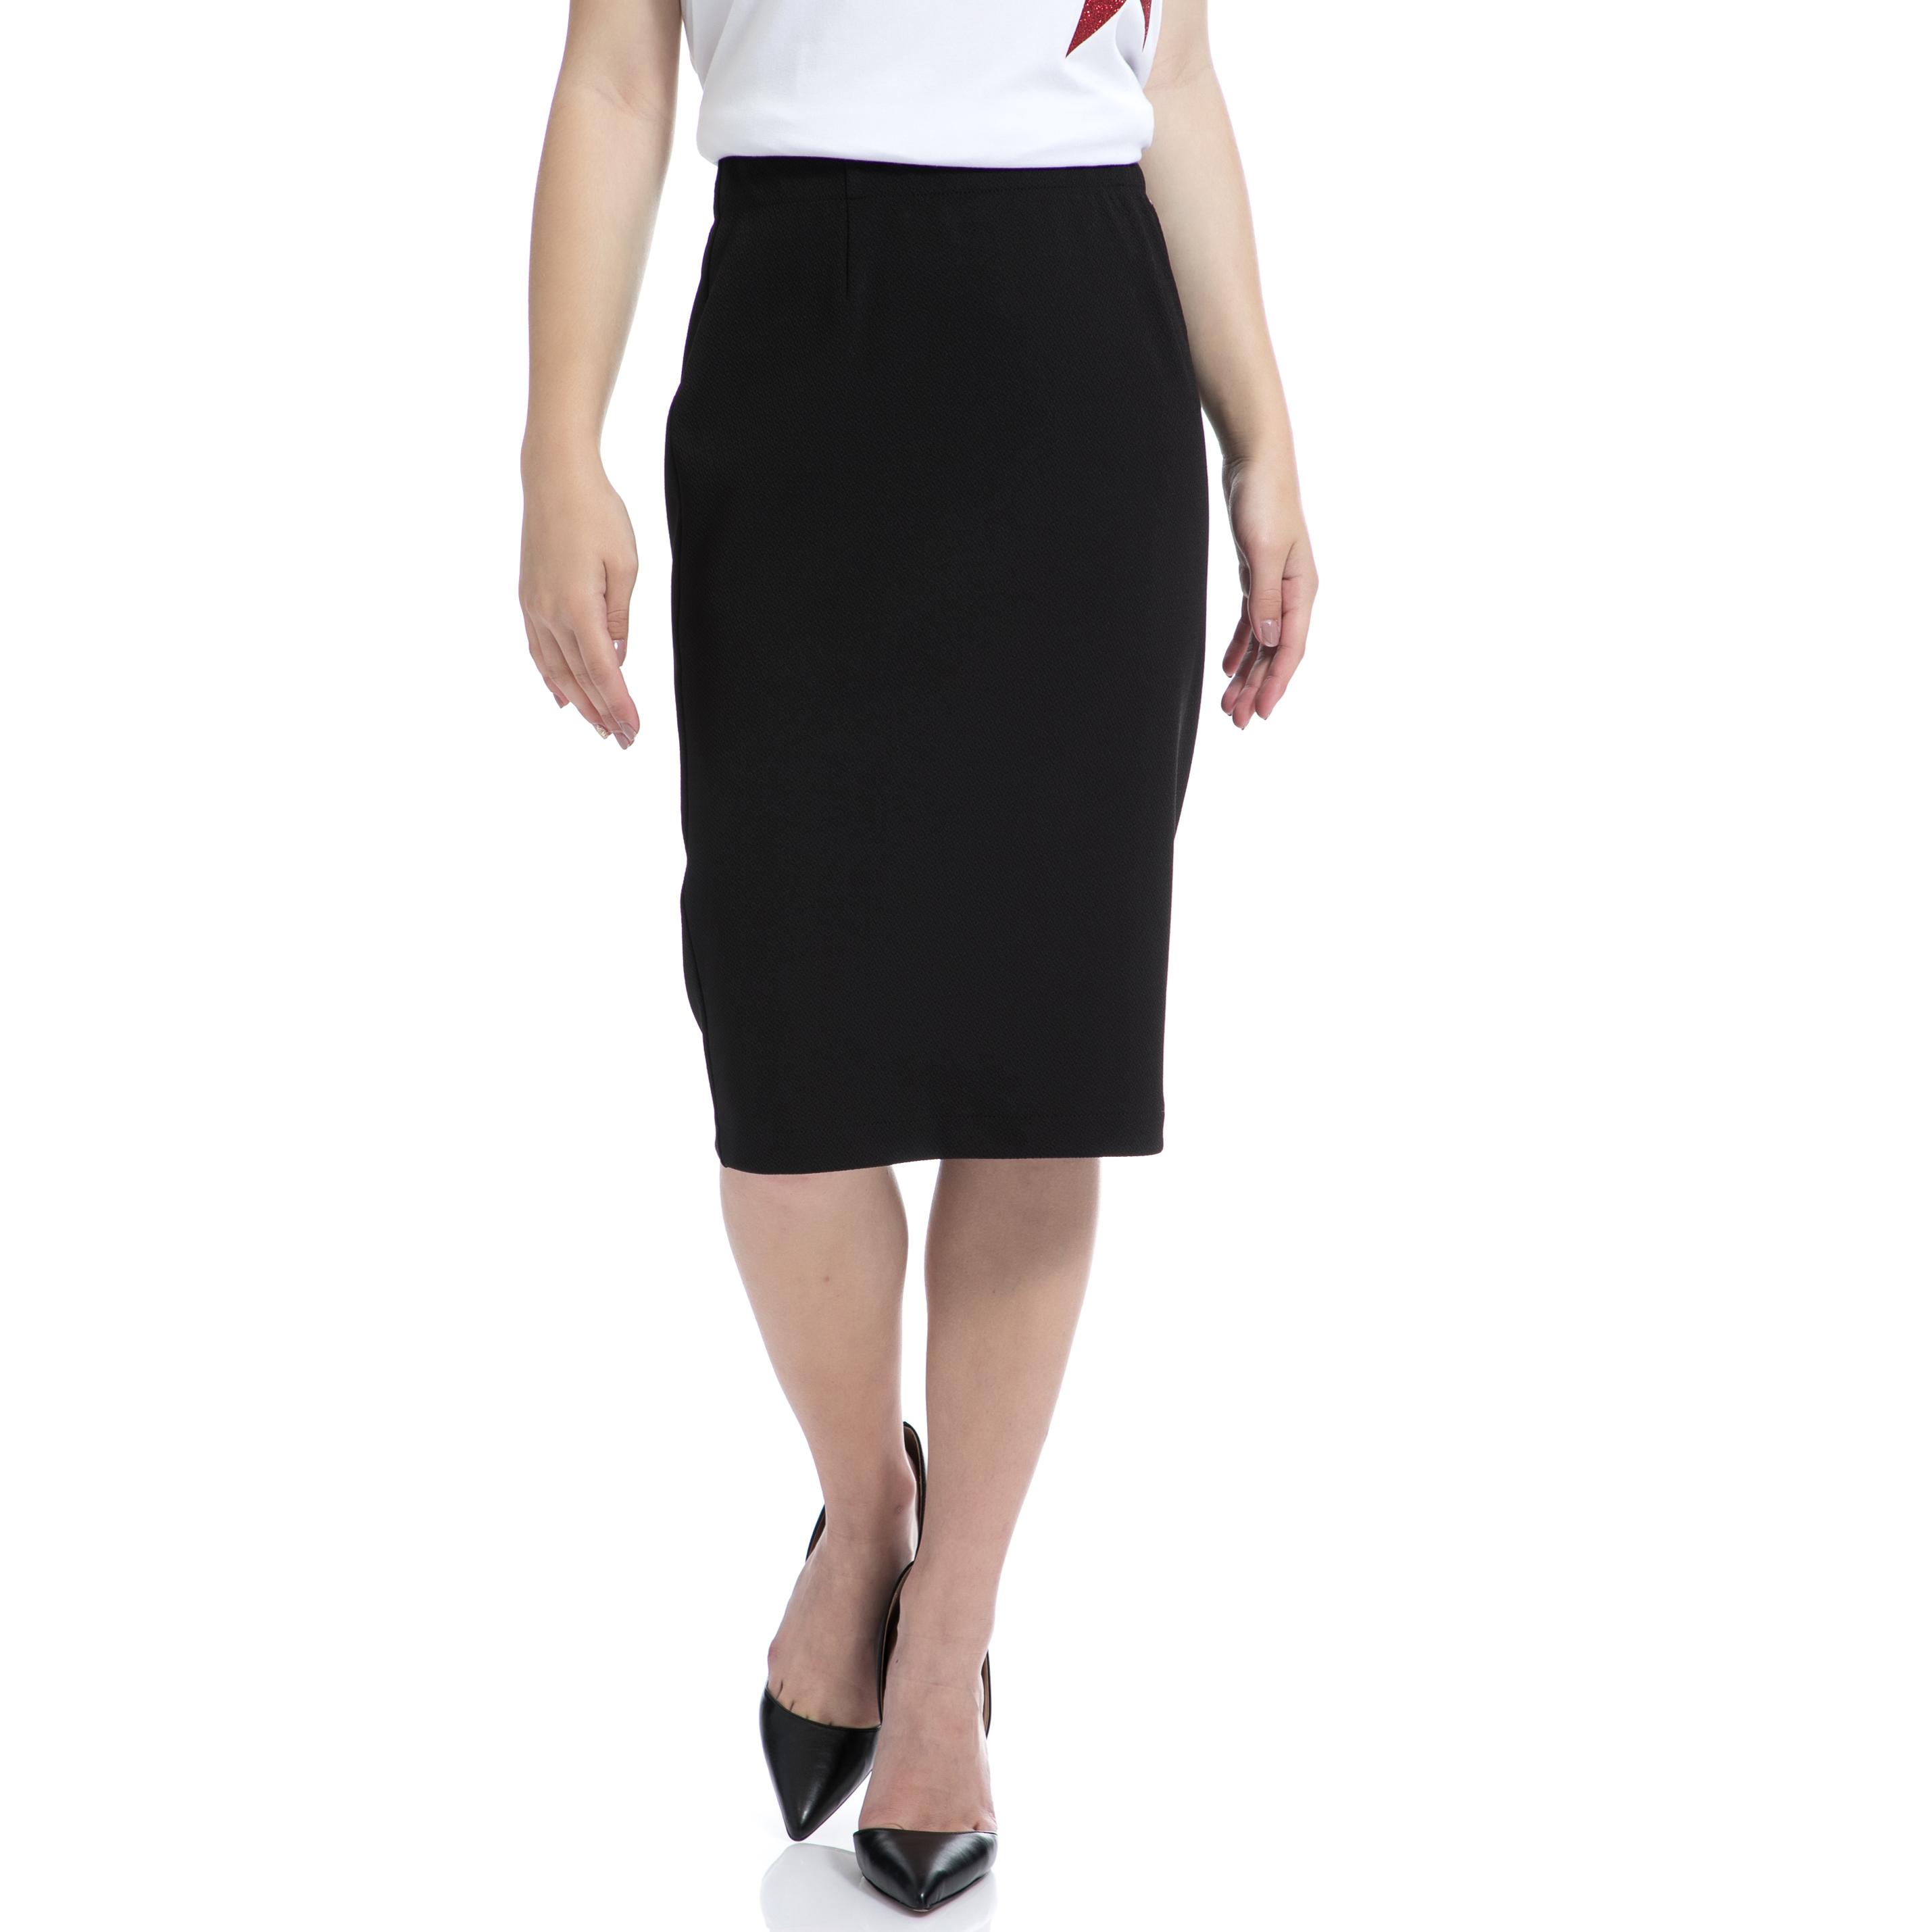 DENNY ROSE - Γυναικεία φούστα Denny Rose μαύρη γυναικεία ρούχα φούστες μέχρι το γόνατο